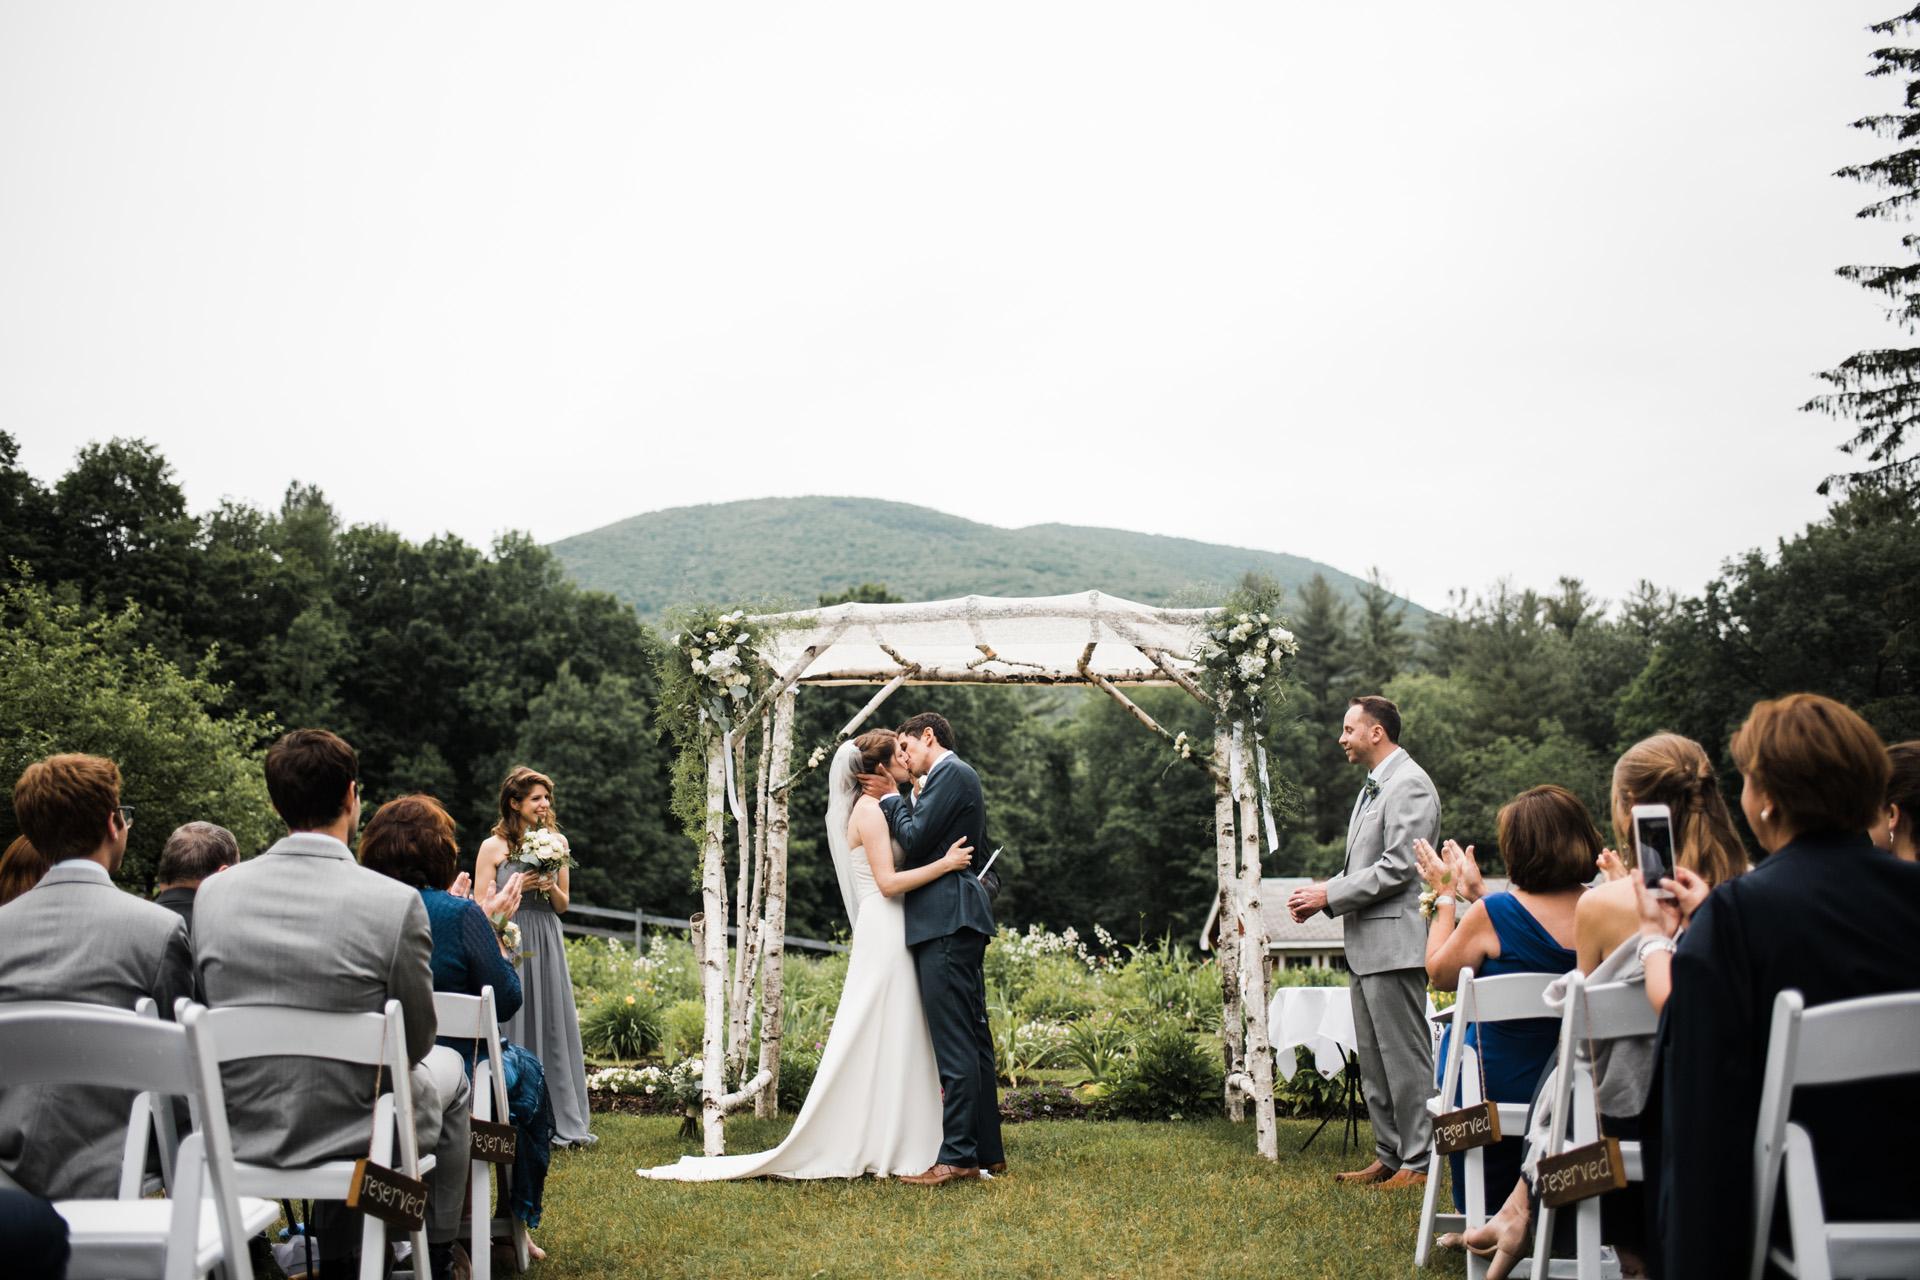 west-mountain-inn-wedding-vermont-34